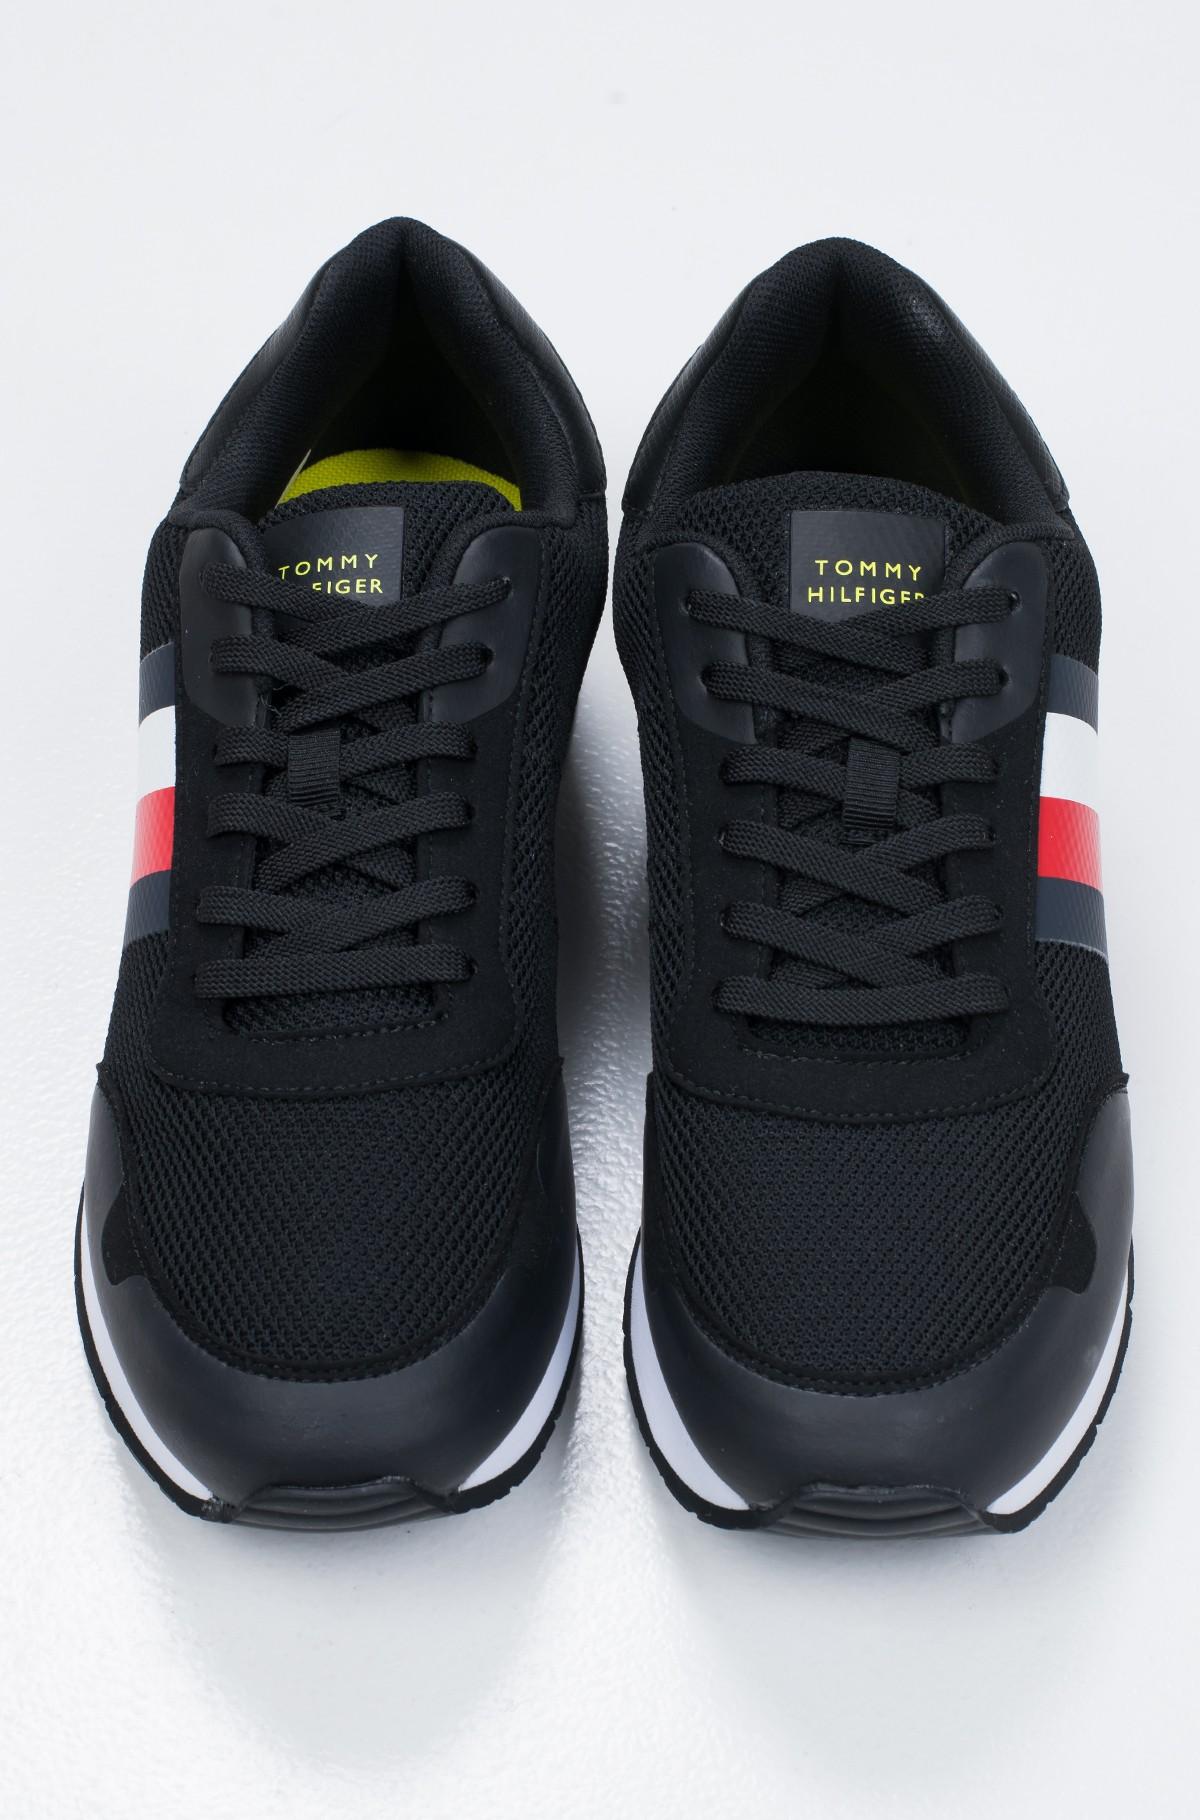 Sportiniai drabužiai CORPORATE MATERIAL MIX RUNNER-full-2